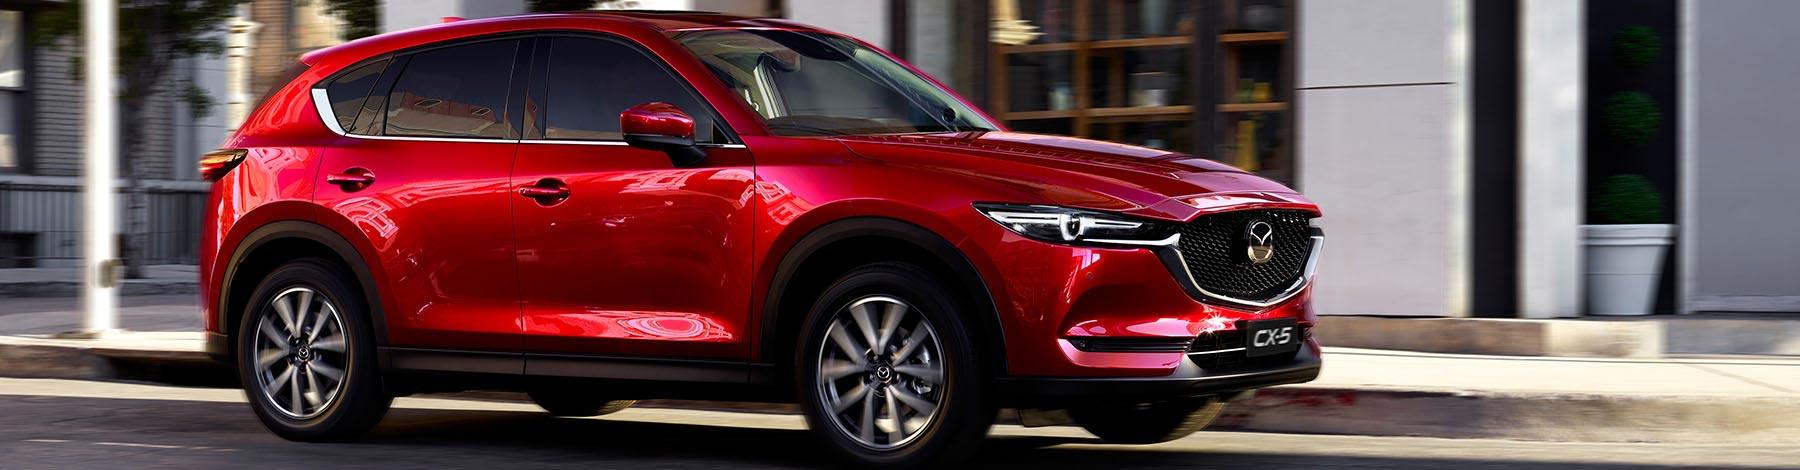 Mazda 6 corporate select